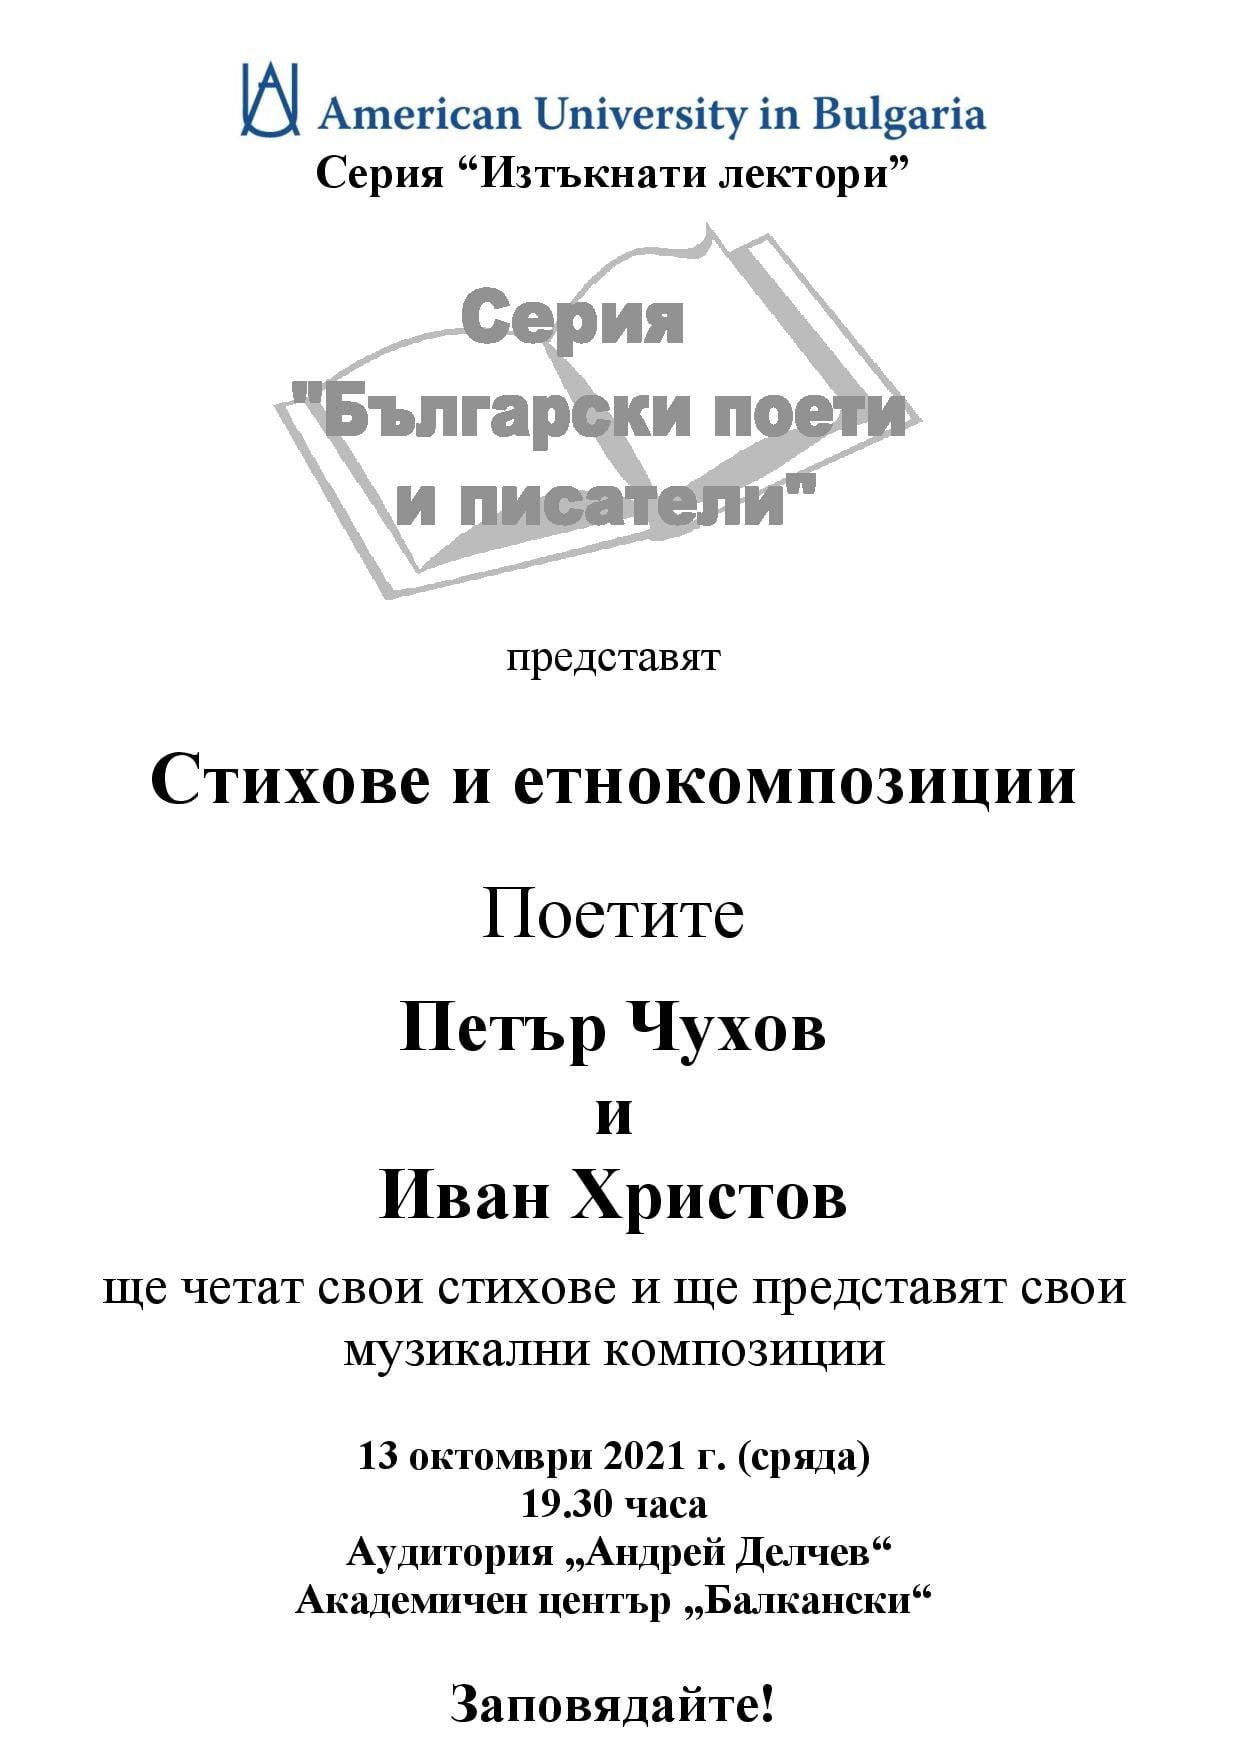 Стихове и етнокомпозиции с поетите Петър Чухов и Иван Христов в Благоевград